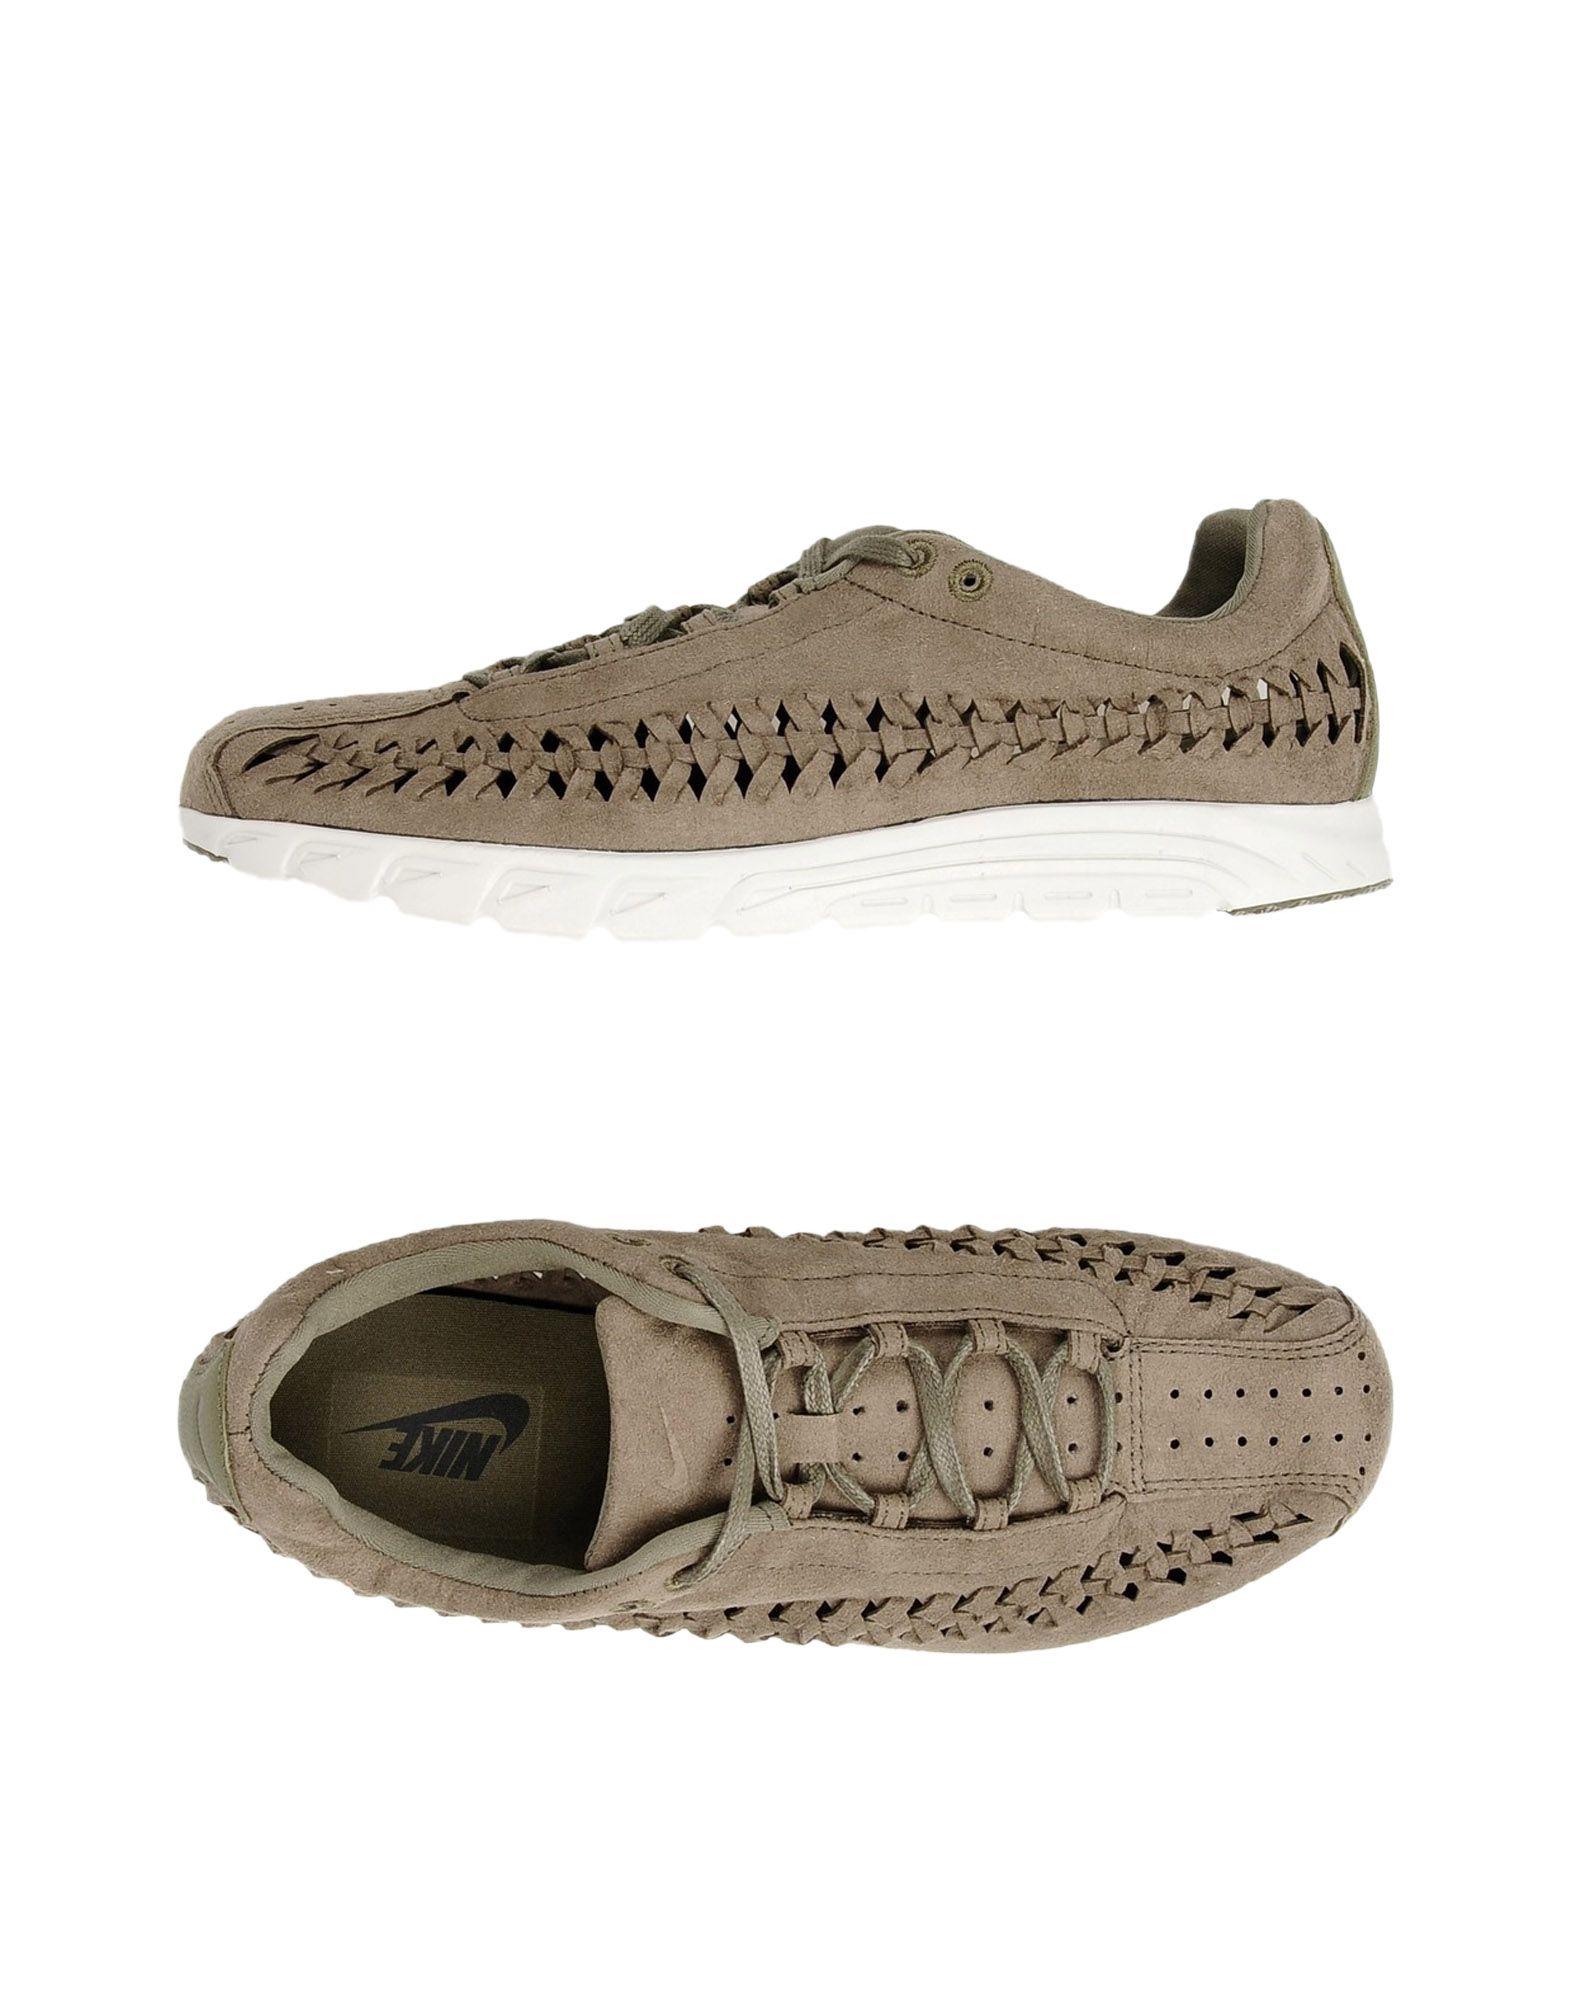 Scarpe da Ginnastica Uomo Nike  Mayfly Woven - Uomo Ginnastica - 11287553HG 02d92a